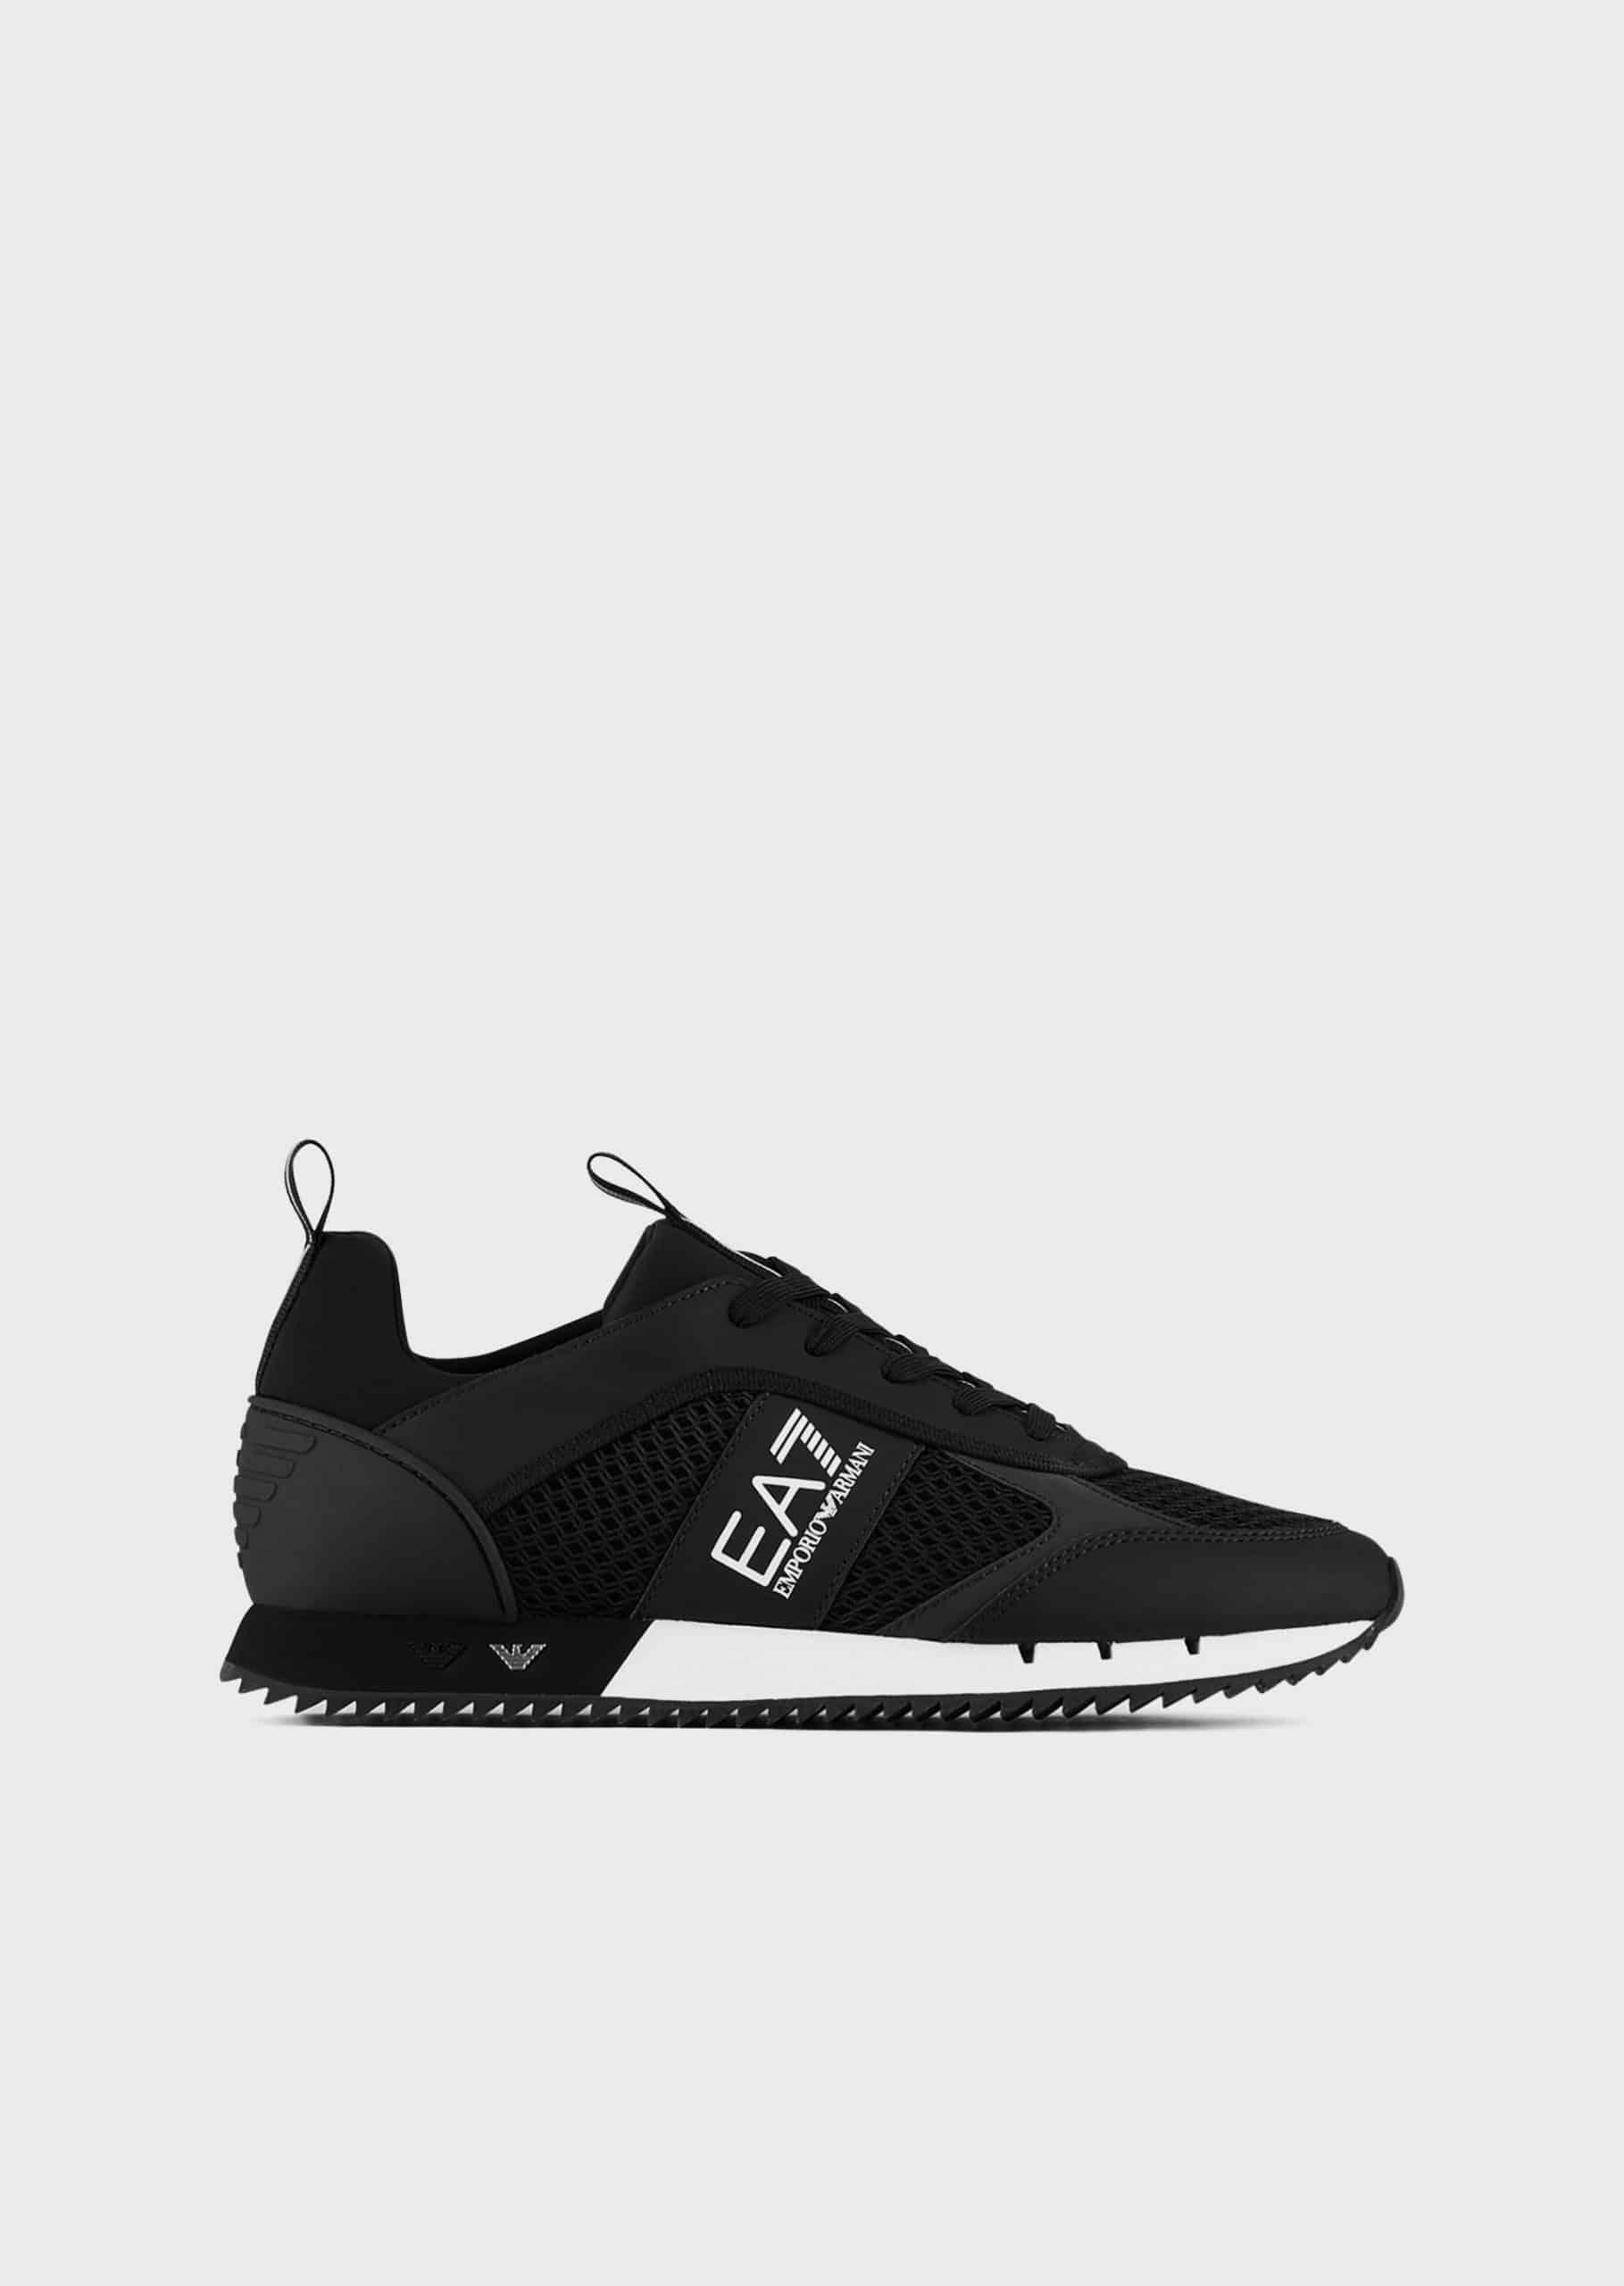 Armani EA7 Black&White Laces Sneakers